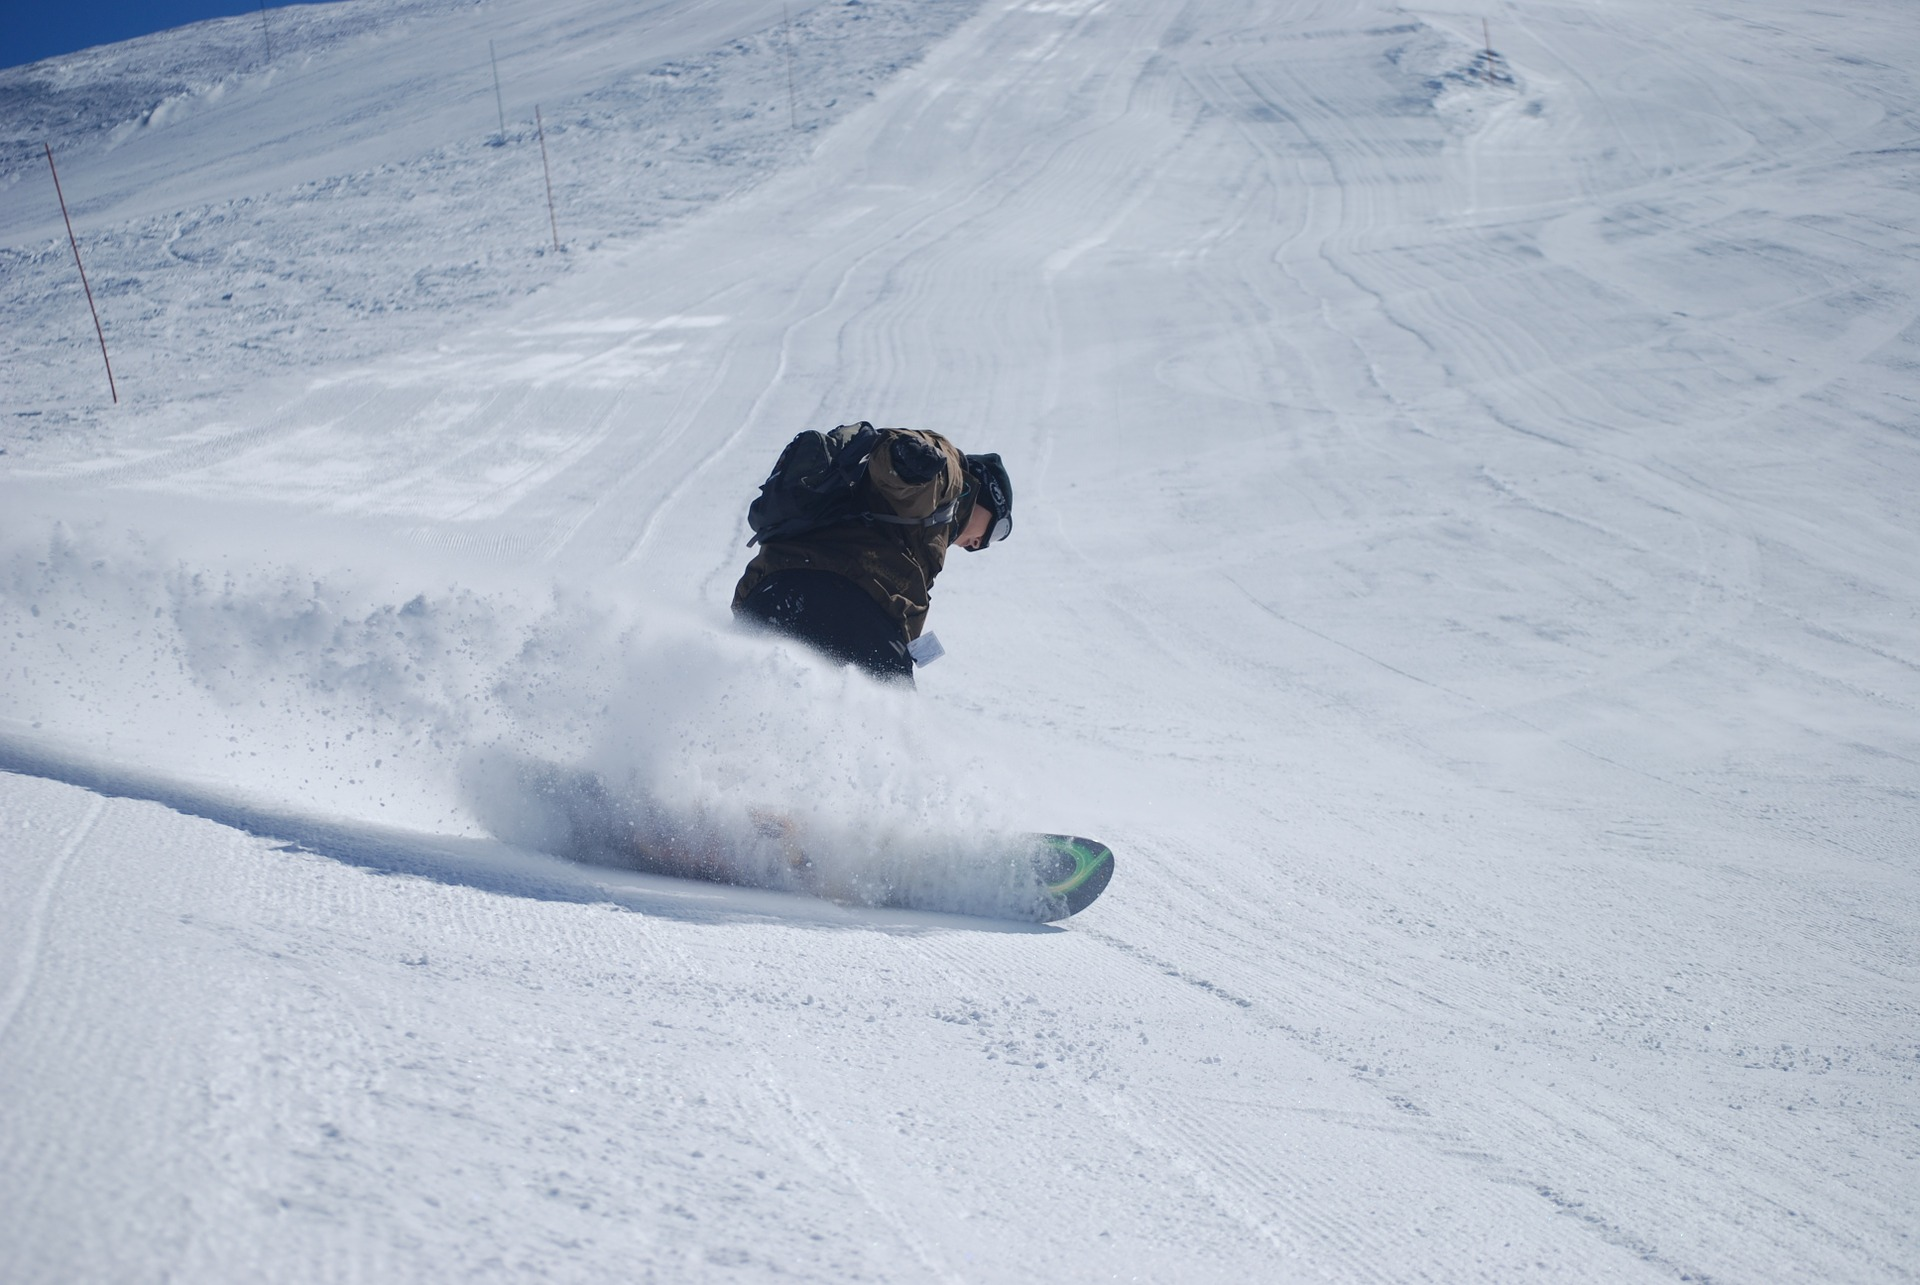 snowboard-779254_1920